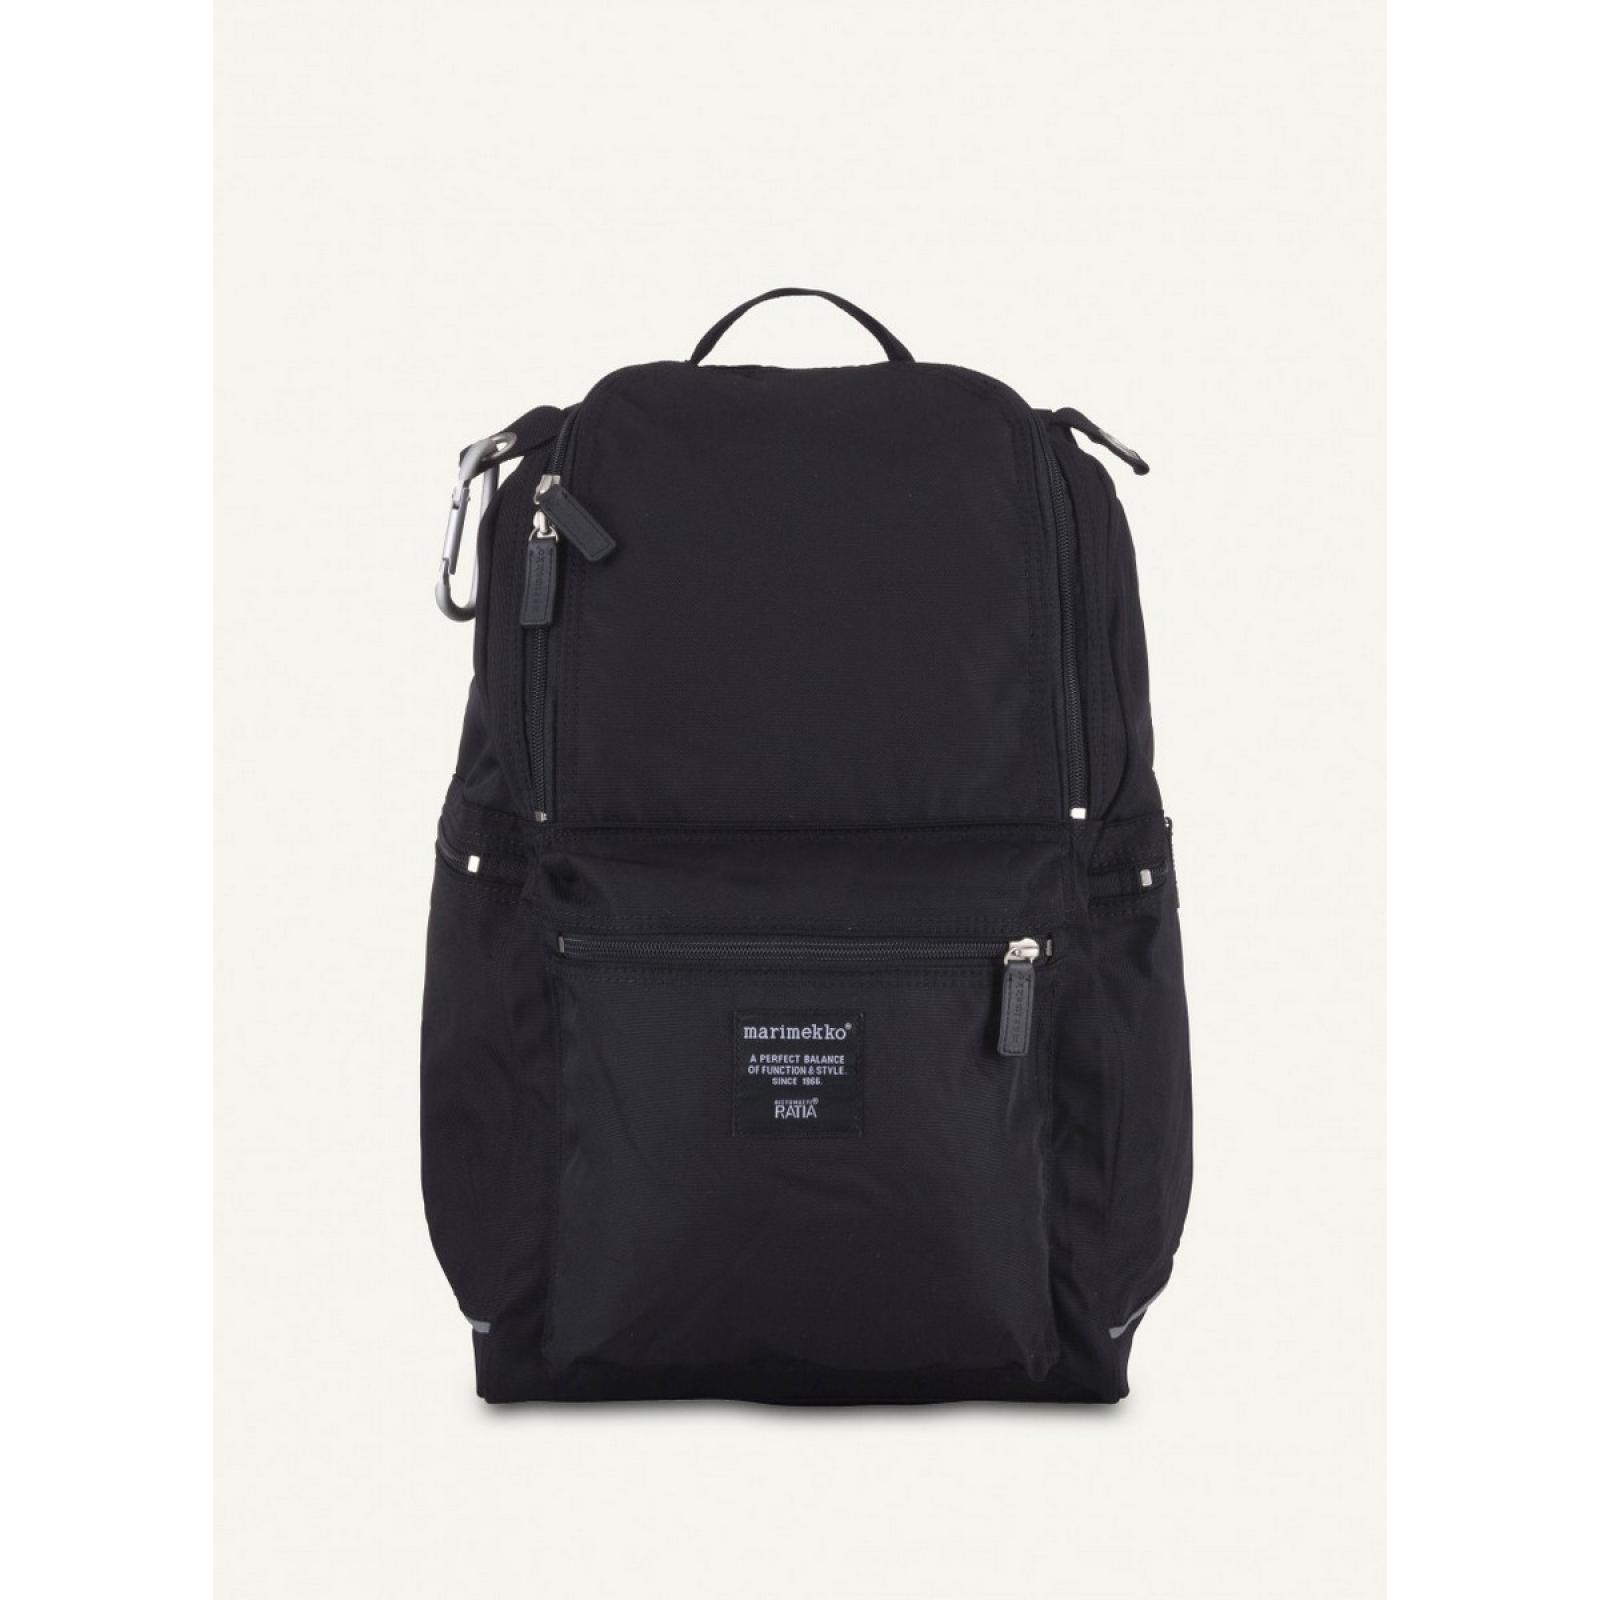 Buddy Backpack-BLACK-UN